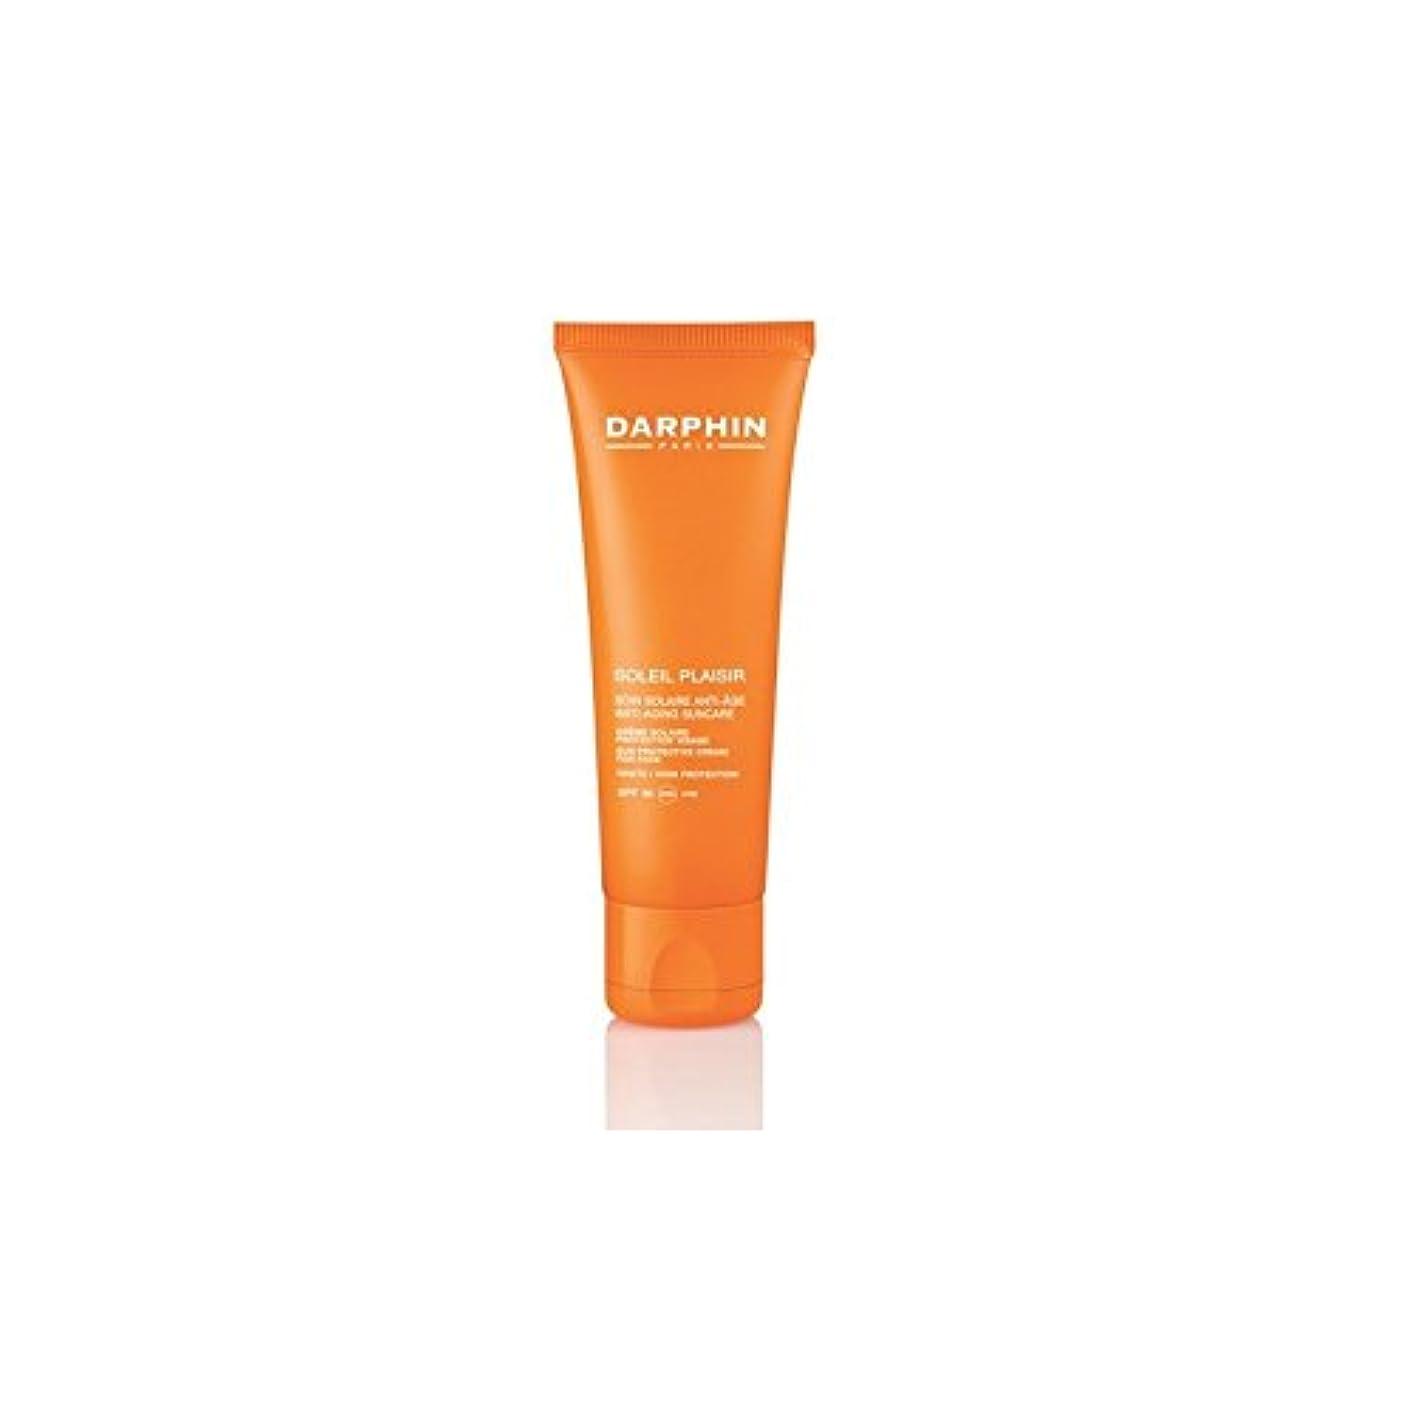 Darphin Soleil Plaisir For Face Moisturiser Spf30 (50ml) - 顔の保湿用30用ダルファンソレイユのプレジール(50ミリリットル) [並行輸入品]